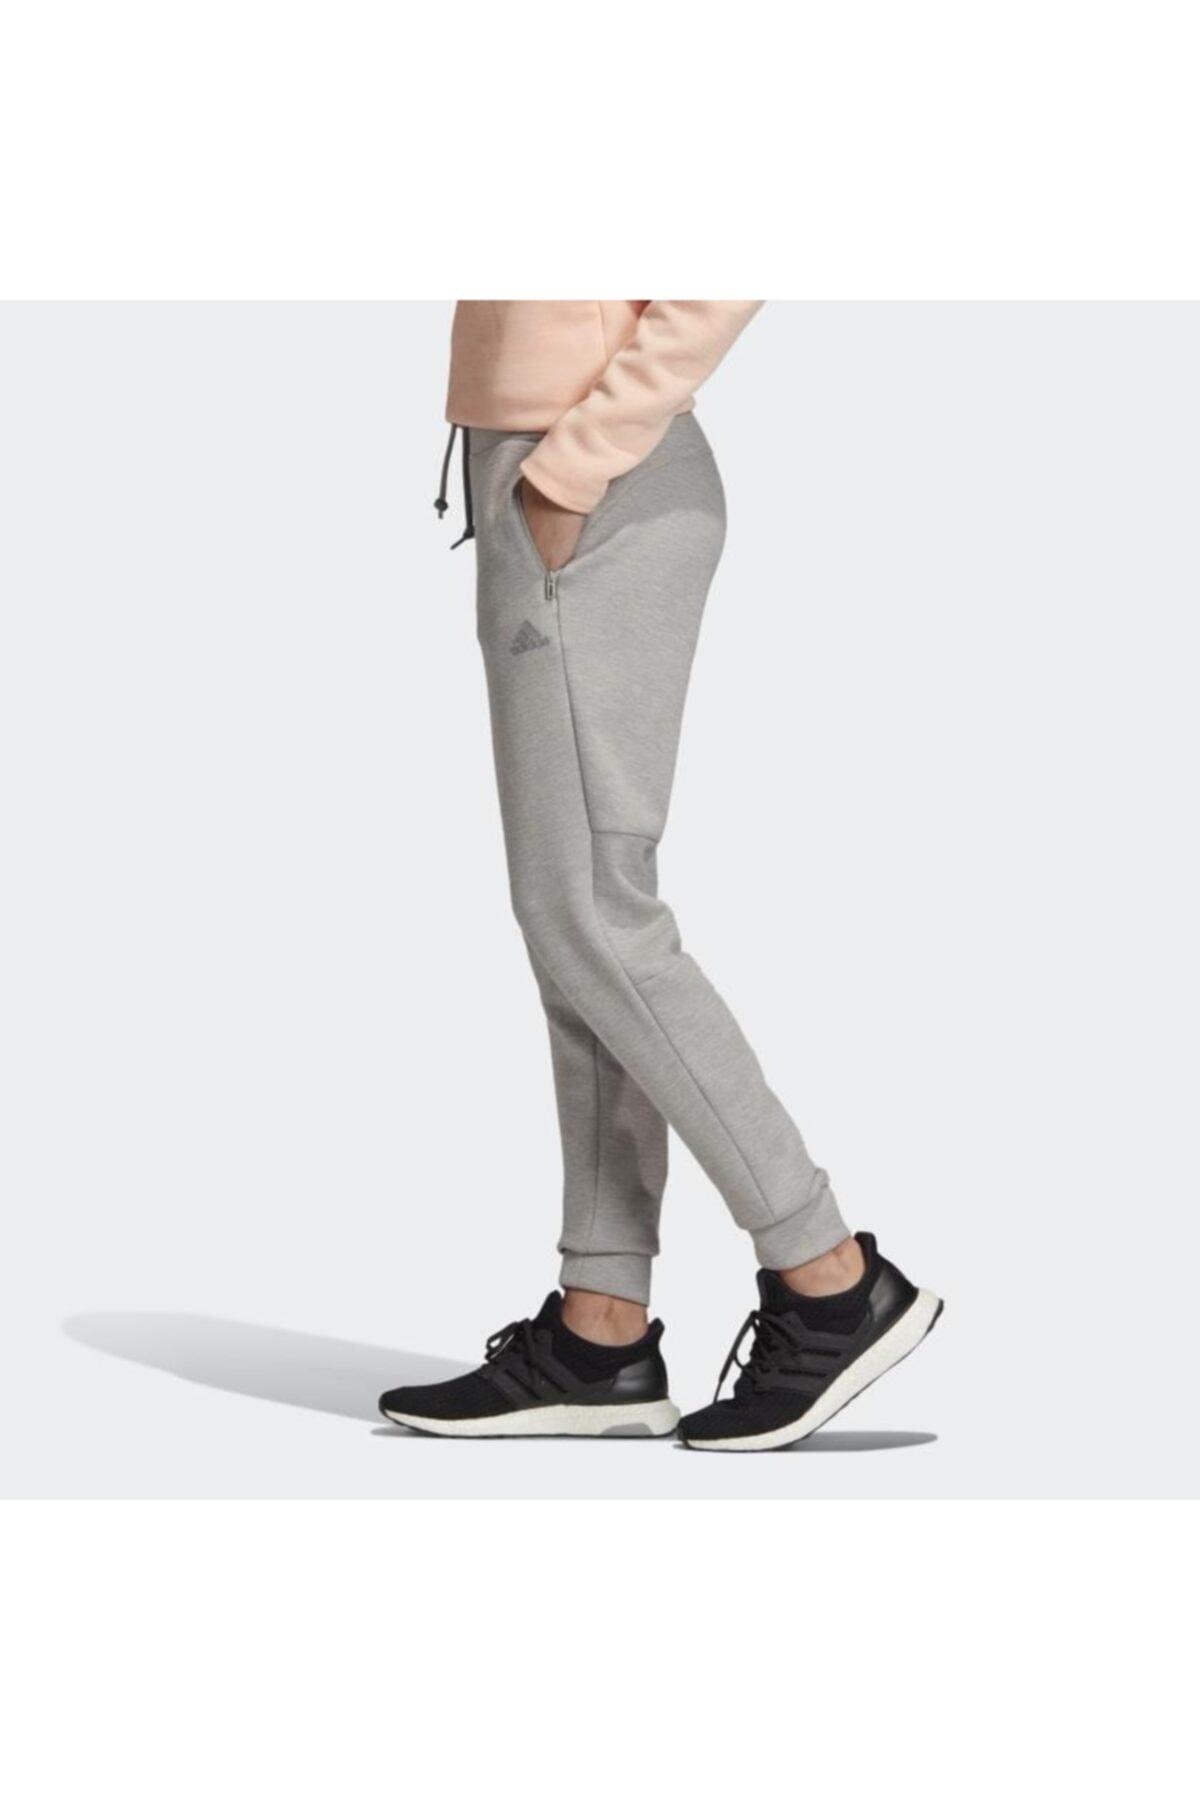 adidas Kadın Günlük Eşofman Altı Fı4096 Gri W Id Melang Pnt 2